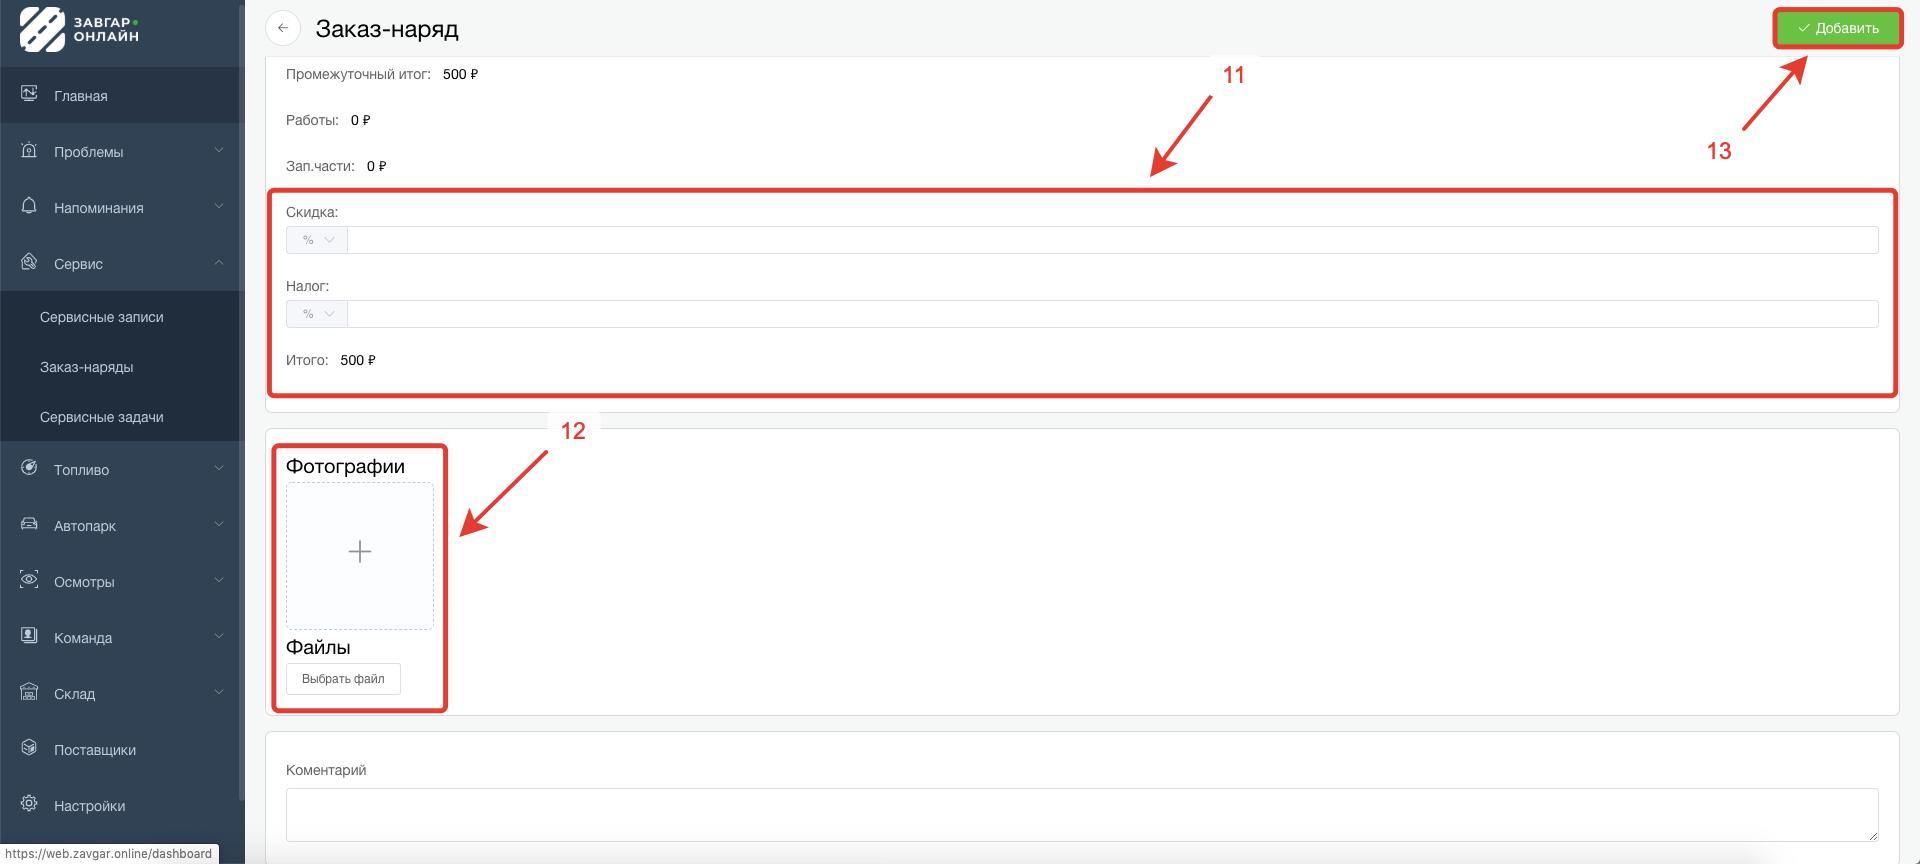 Порядок действий при добавлении заказ-наряда в системе Завгар Онлайн 3